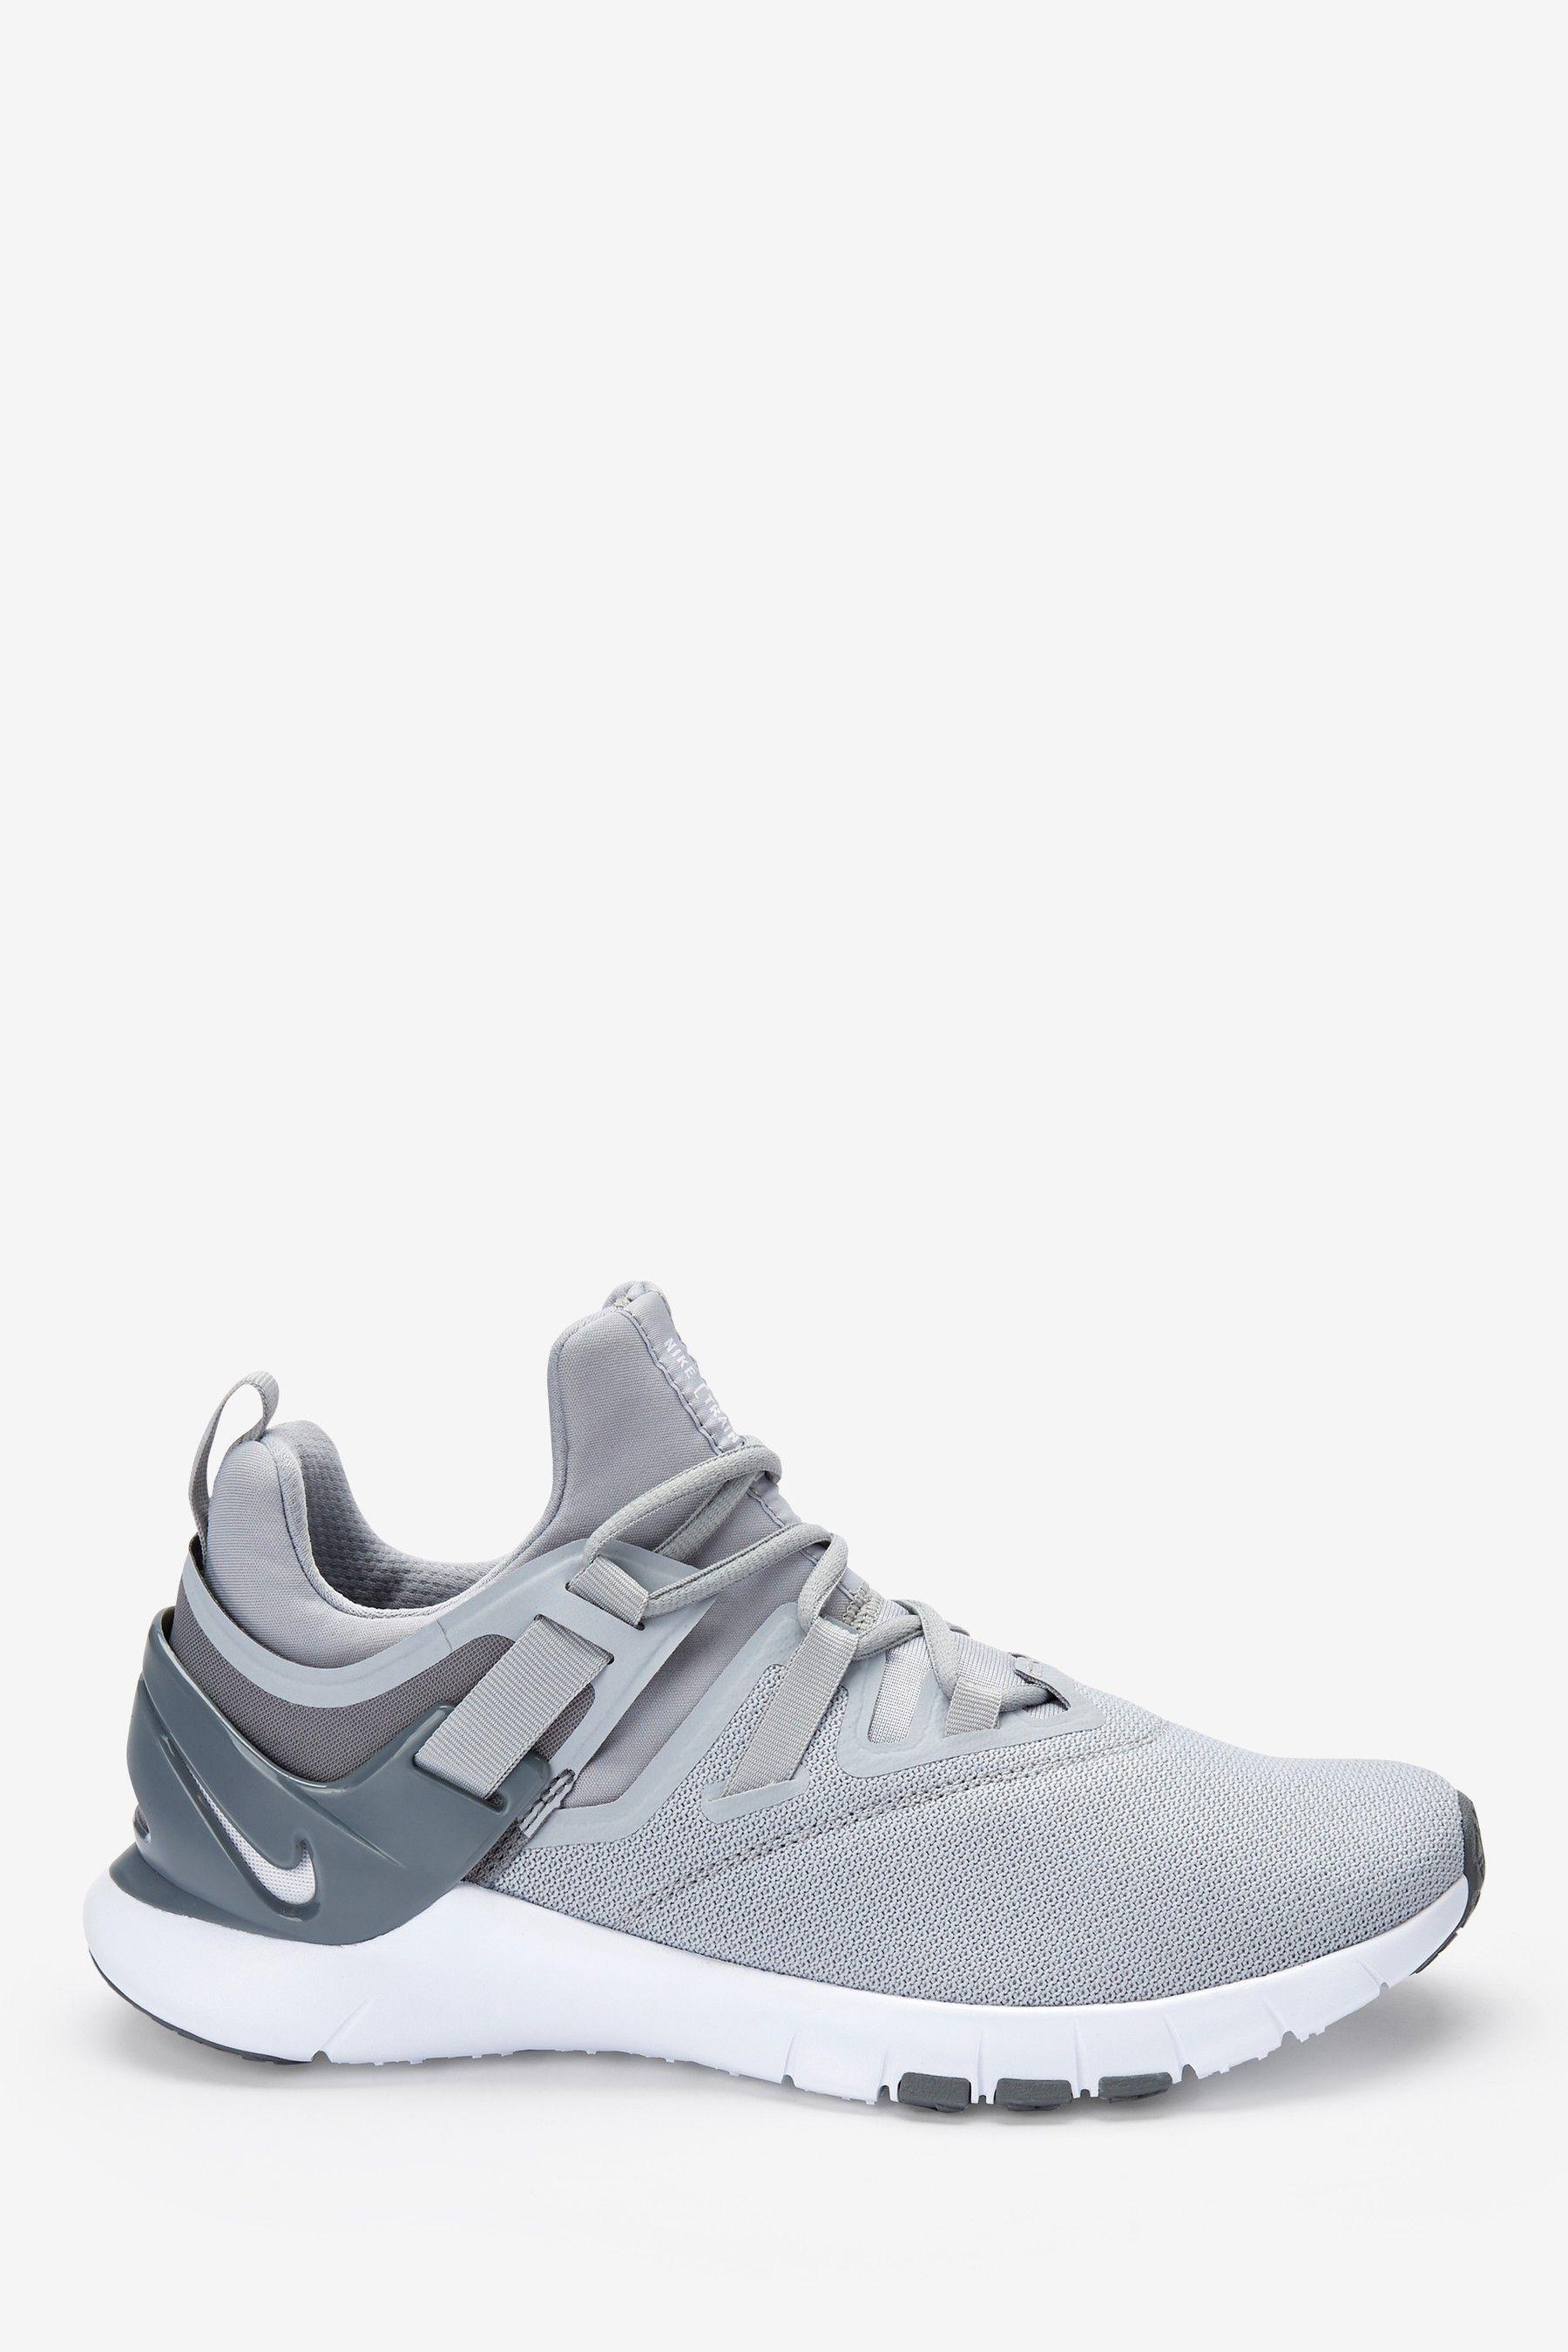 Mens Nike Train Method 2 Trainers Grey | Nike, Trainers